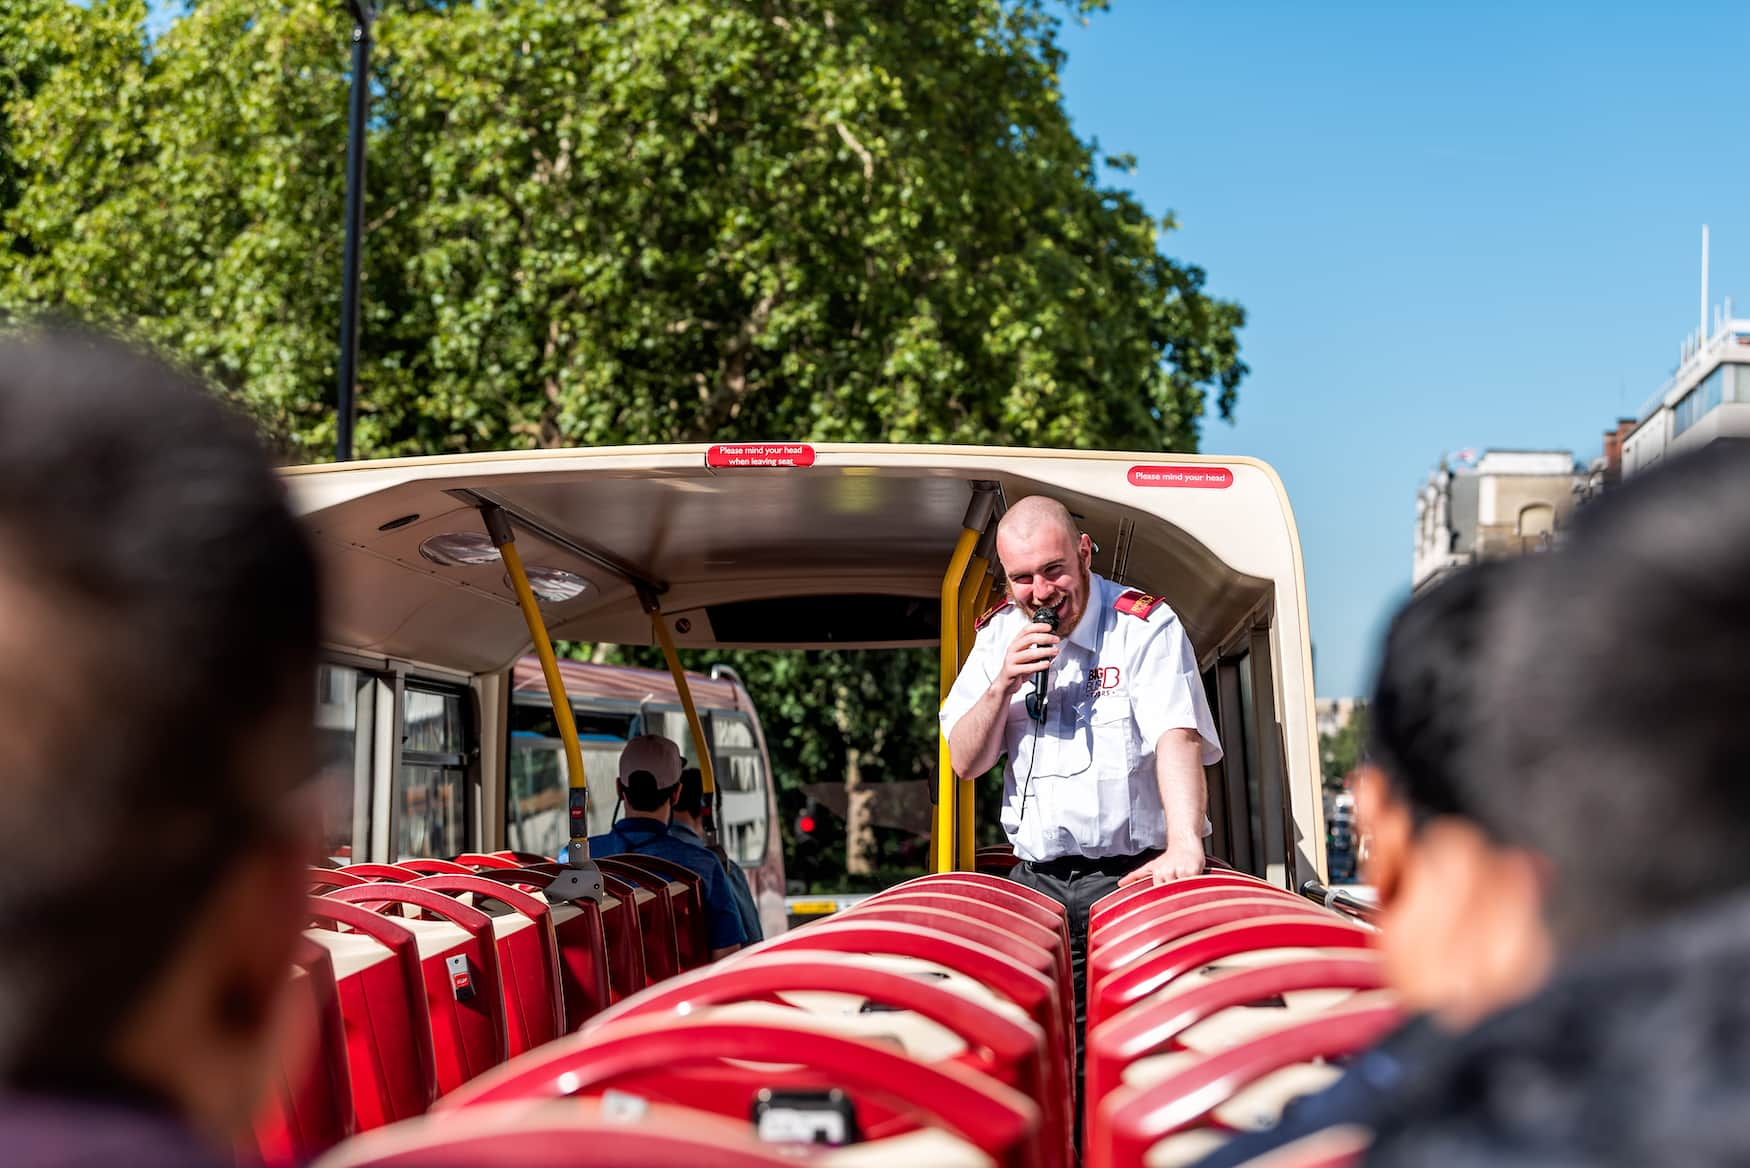 London mit Kindern: Sightseeing-Tour im roten Hop On Hop Off bus